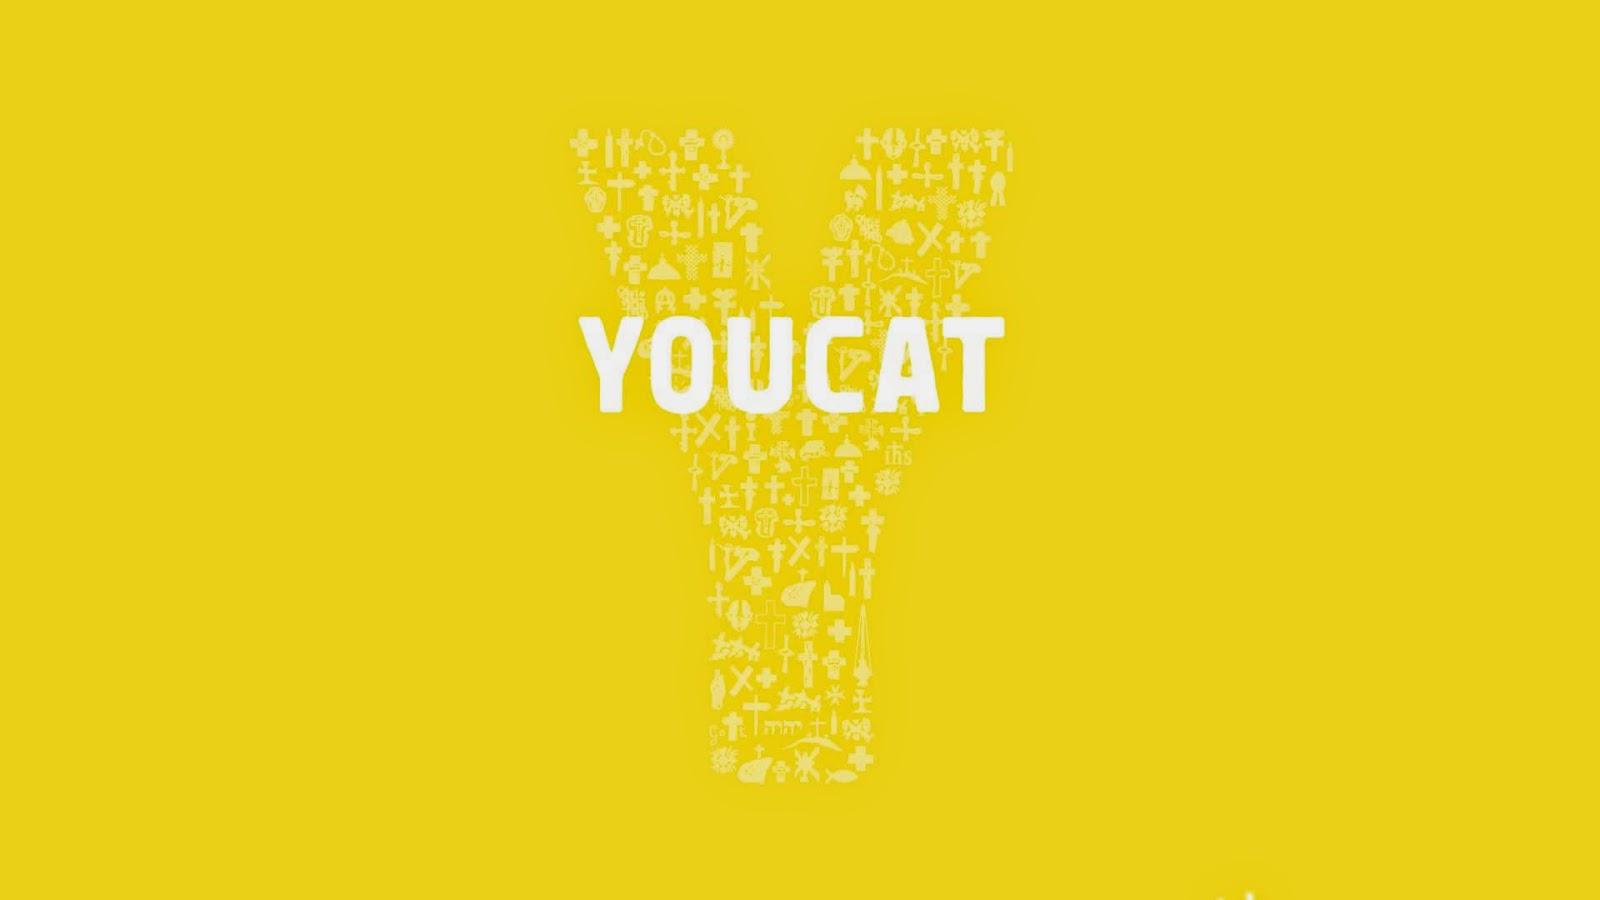 http://www.colegiocristorey.org/pastoral/clasedereligion/Youcat.pdf